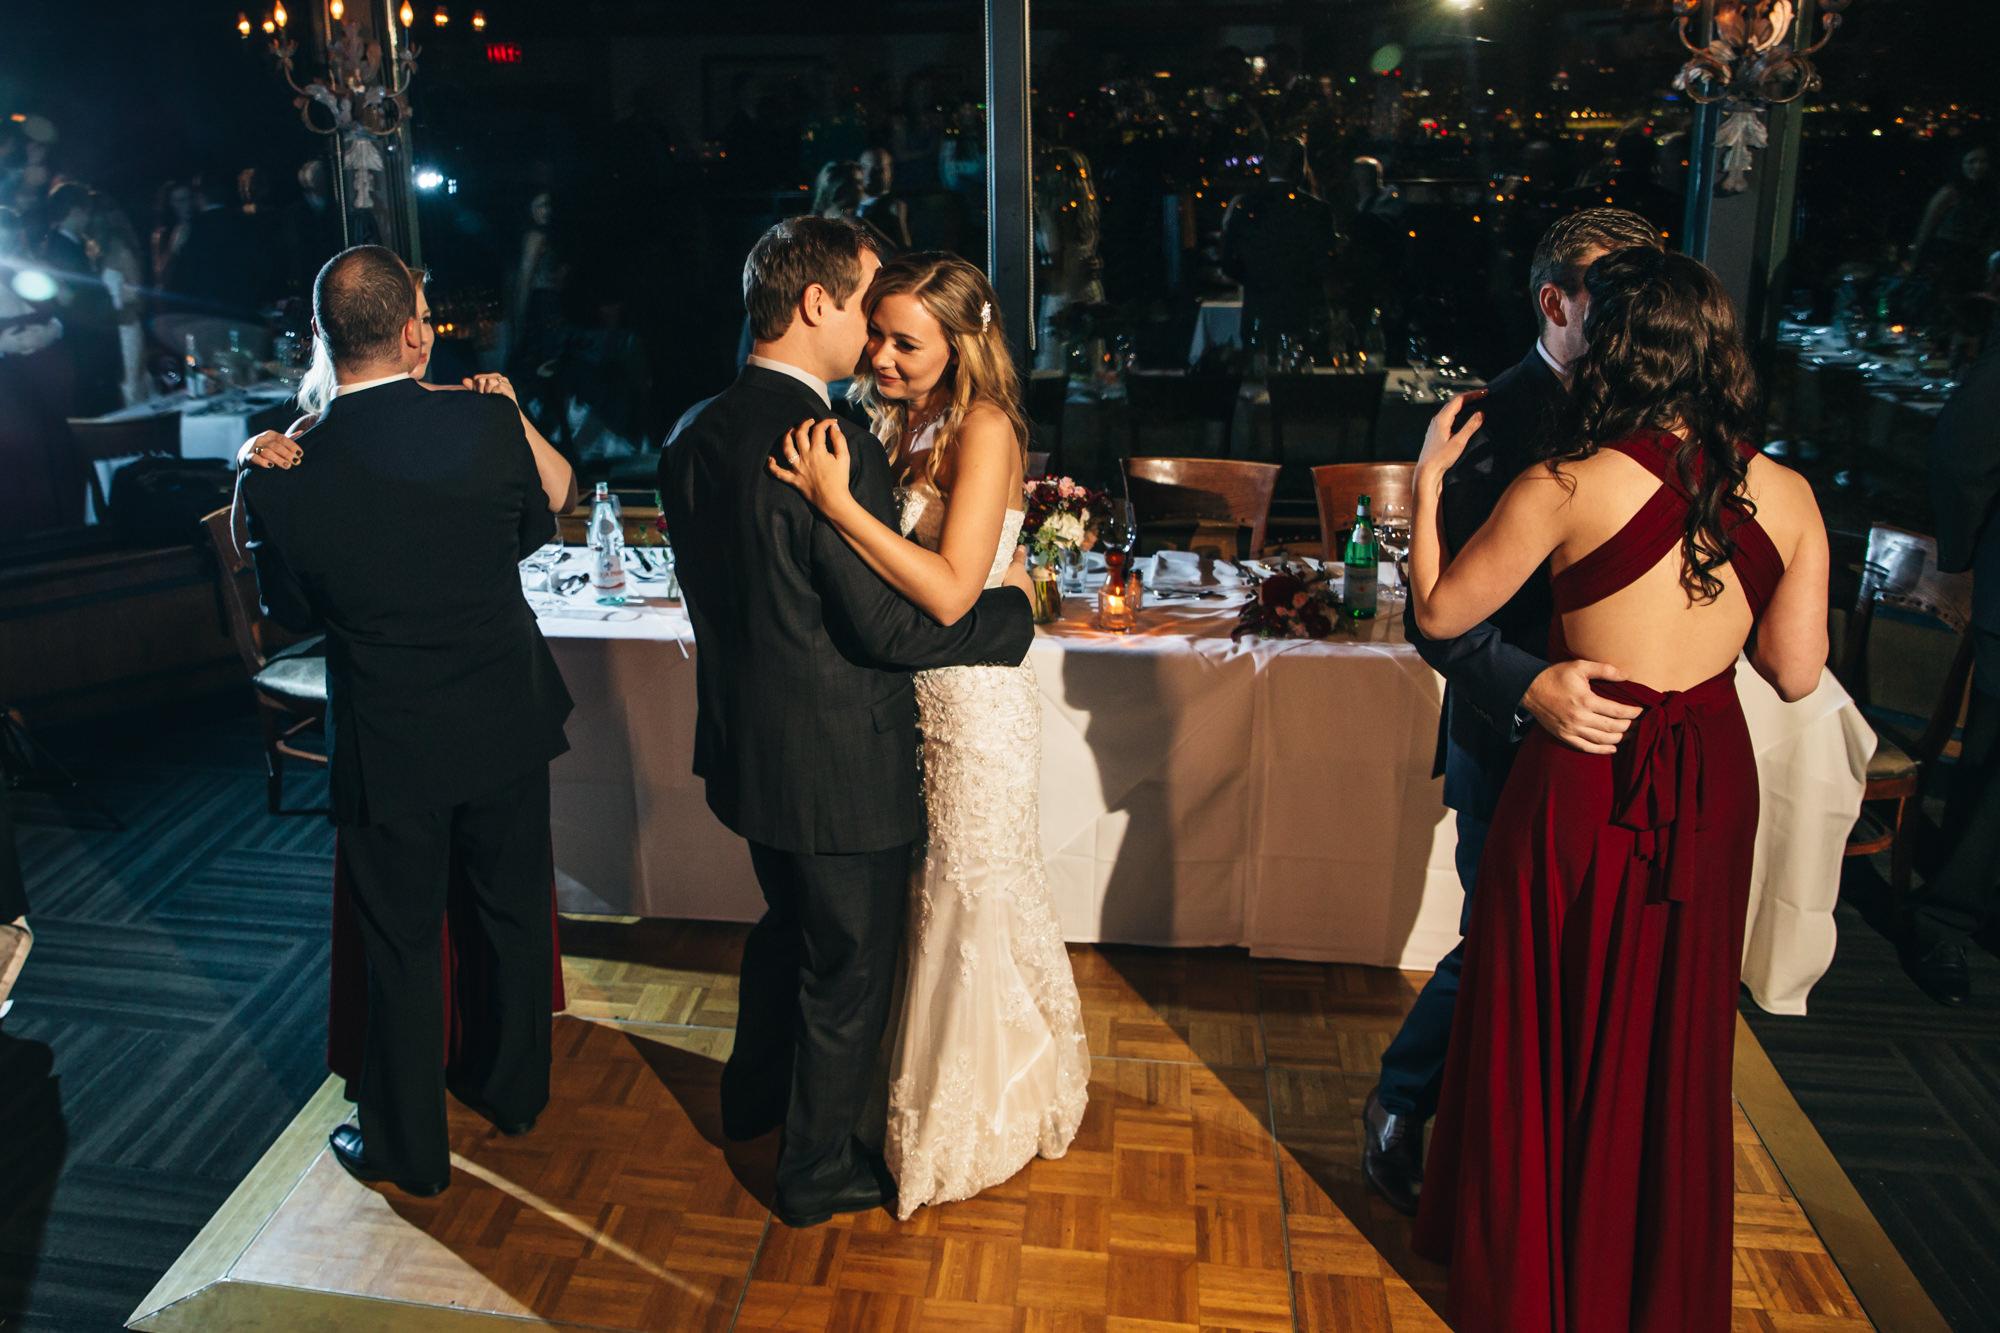 49-seasons-in-the-park-wedding-reception.jpg